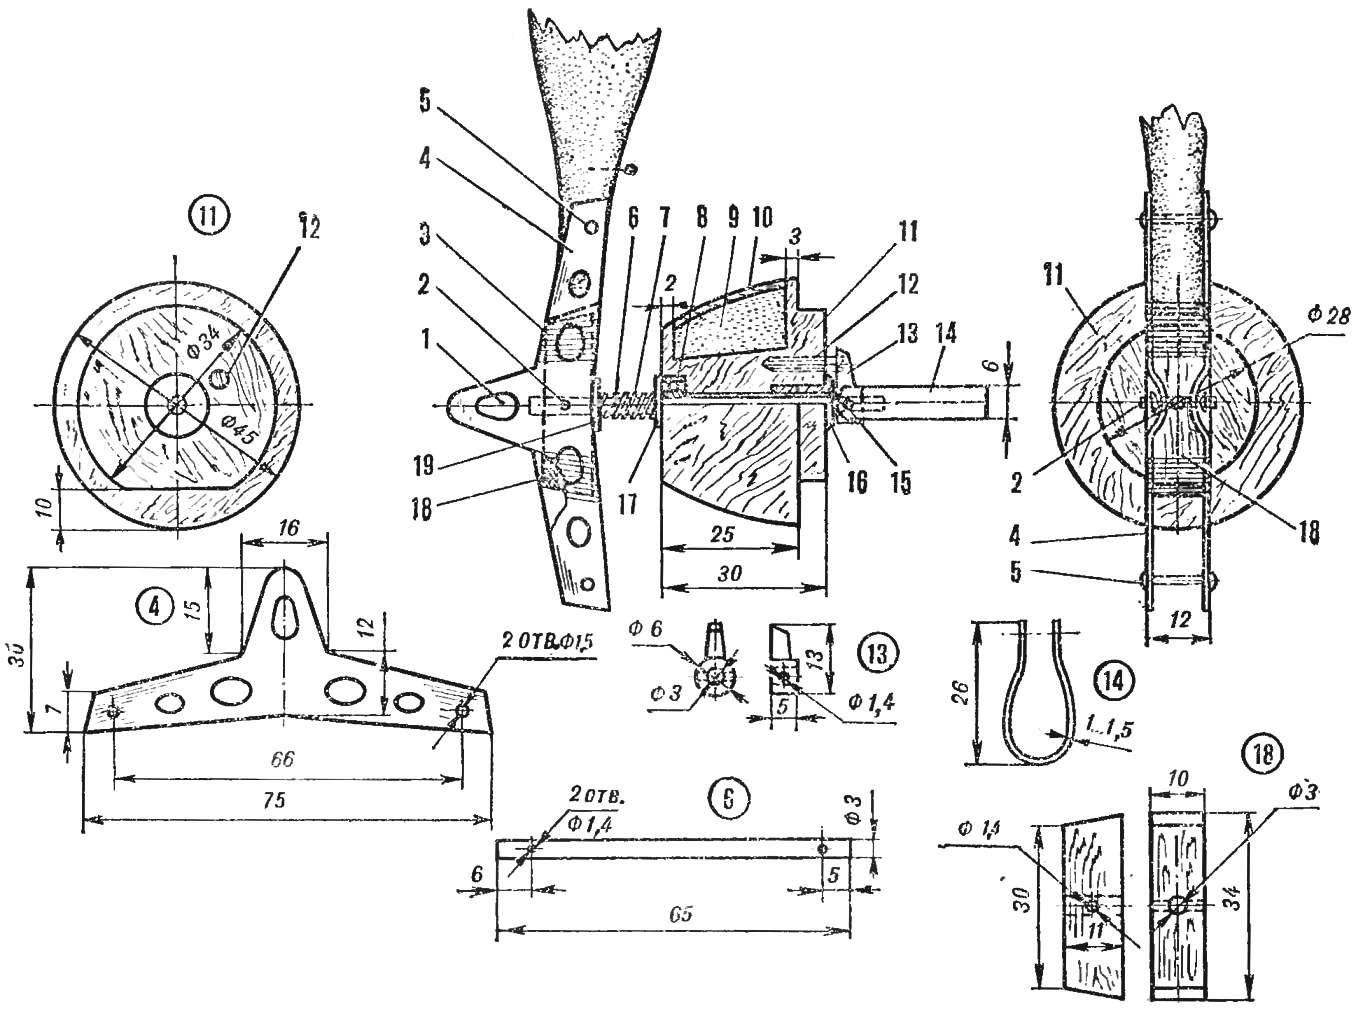 Fig. 7. Hub, the lug and retainer